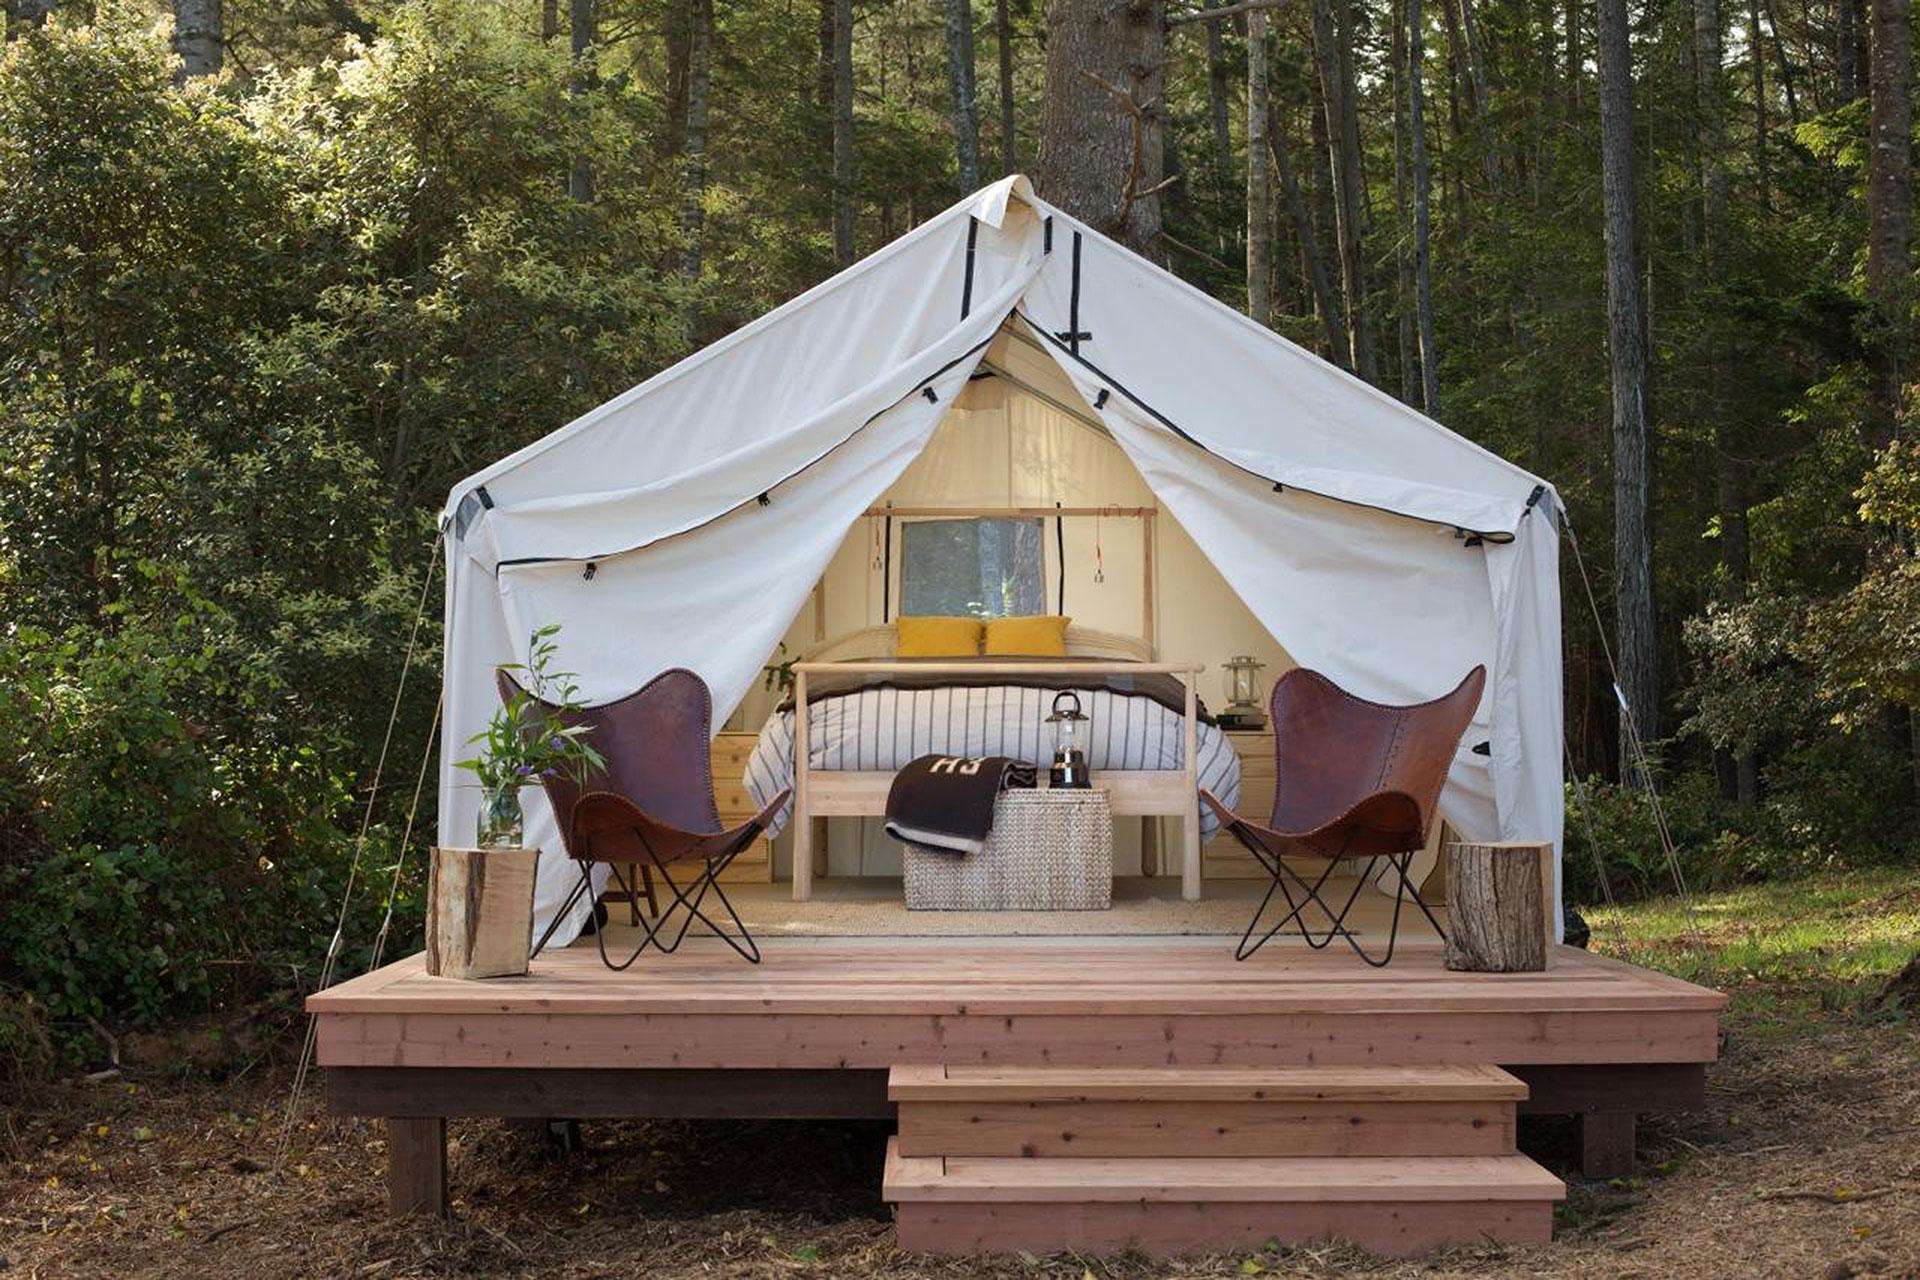 Mendocino Campground in Mendocino, CA